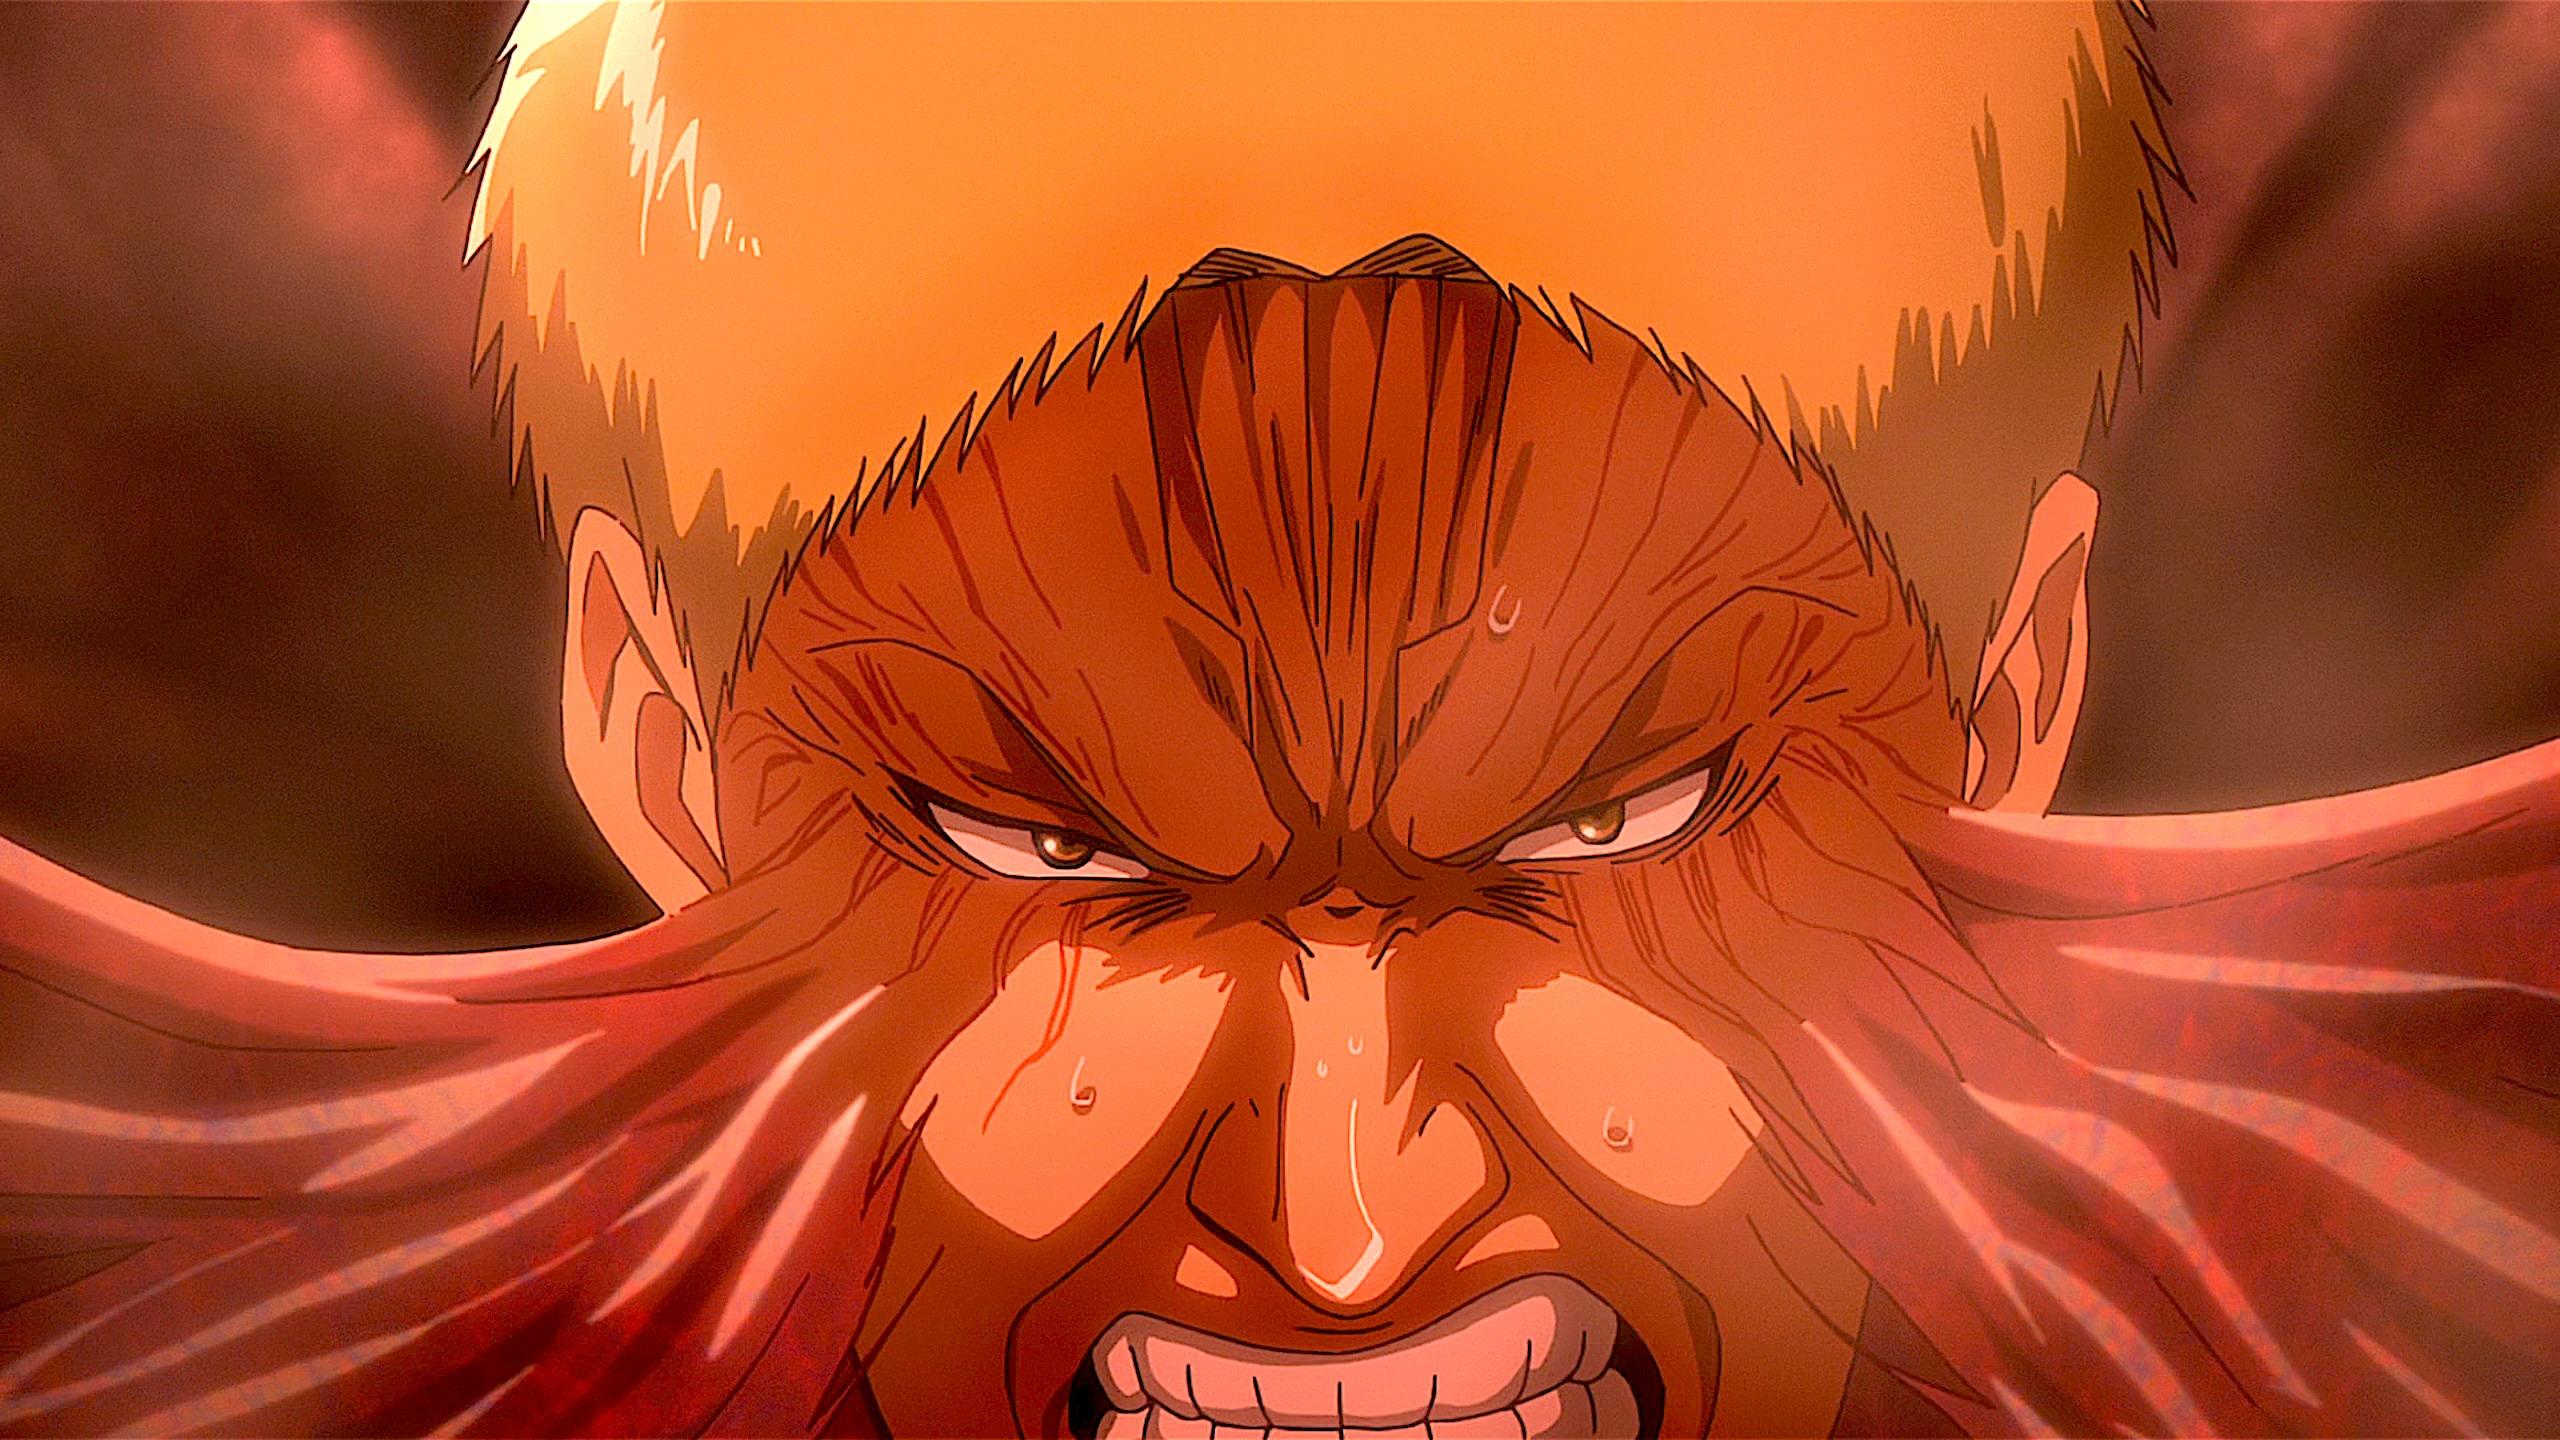 Download Original Attack On Titan 1080p Hd 21947 Hd